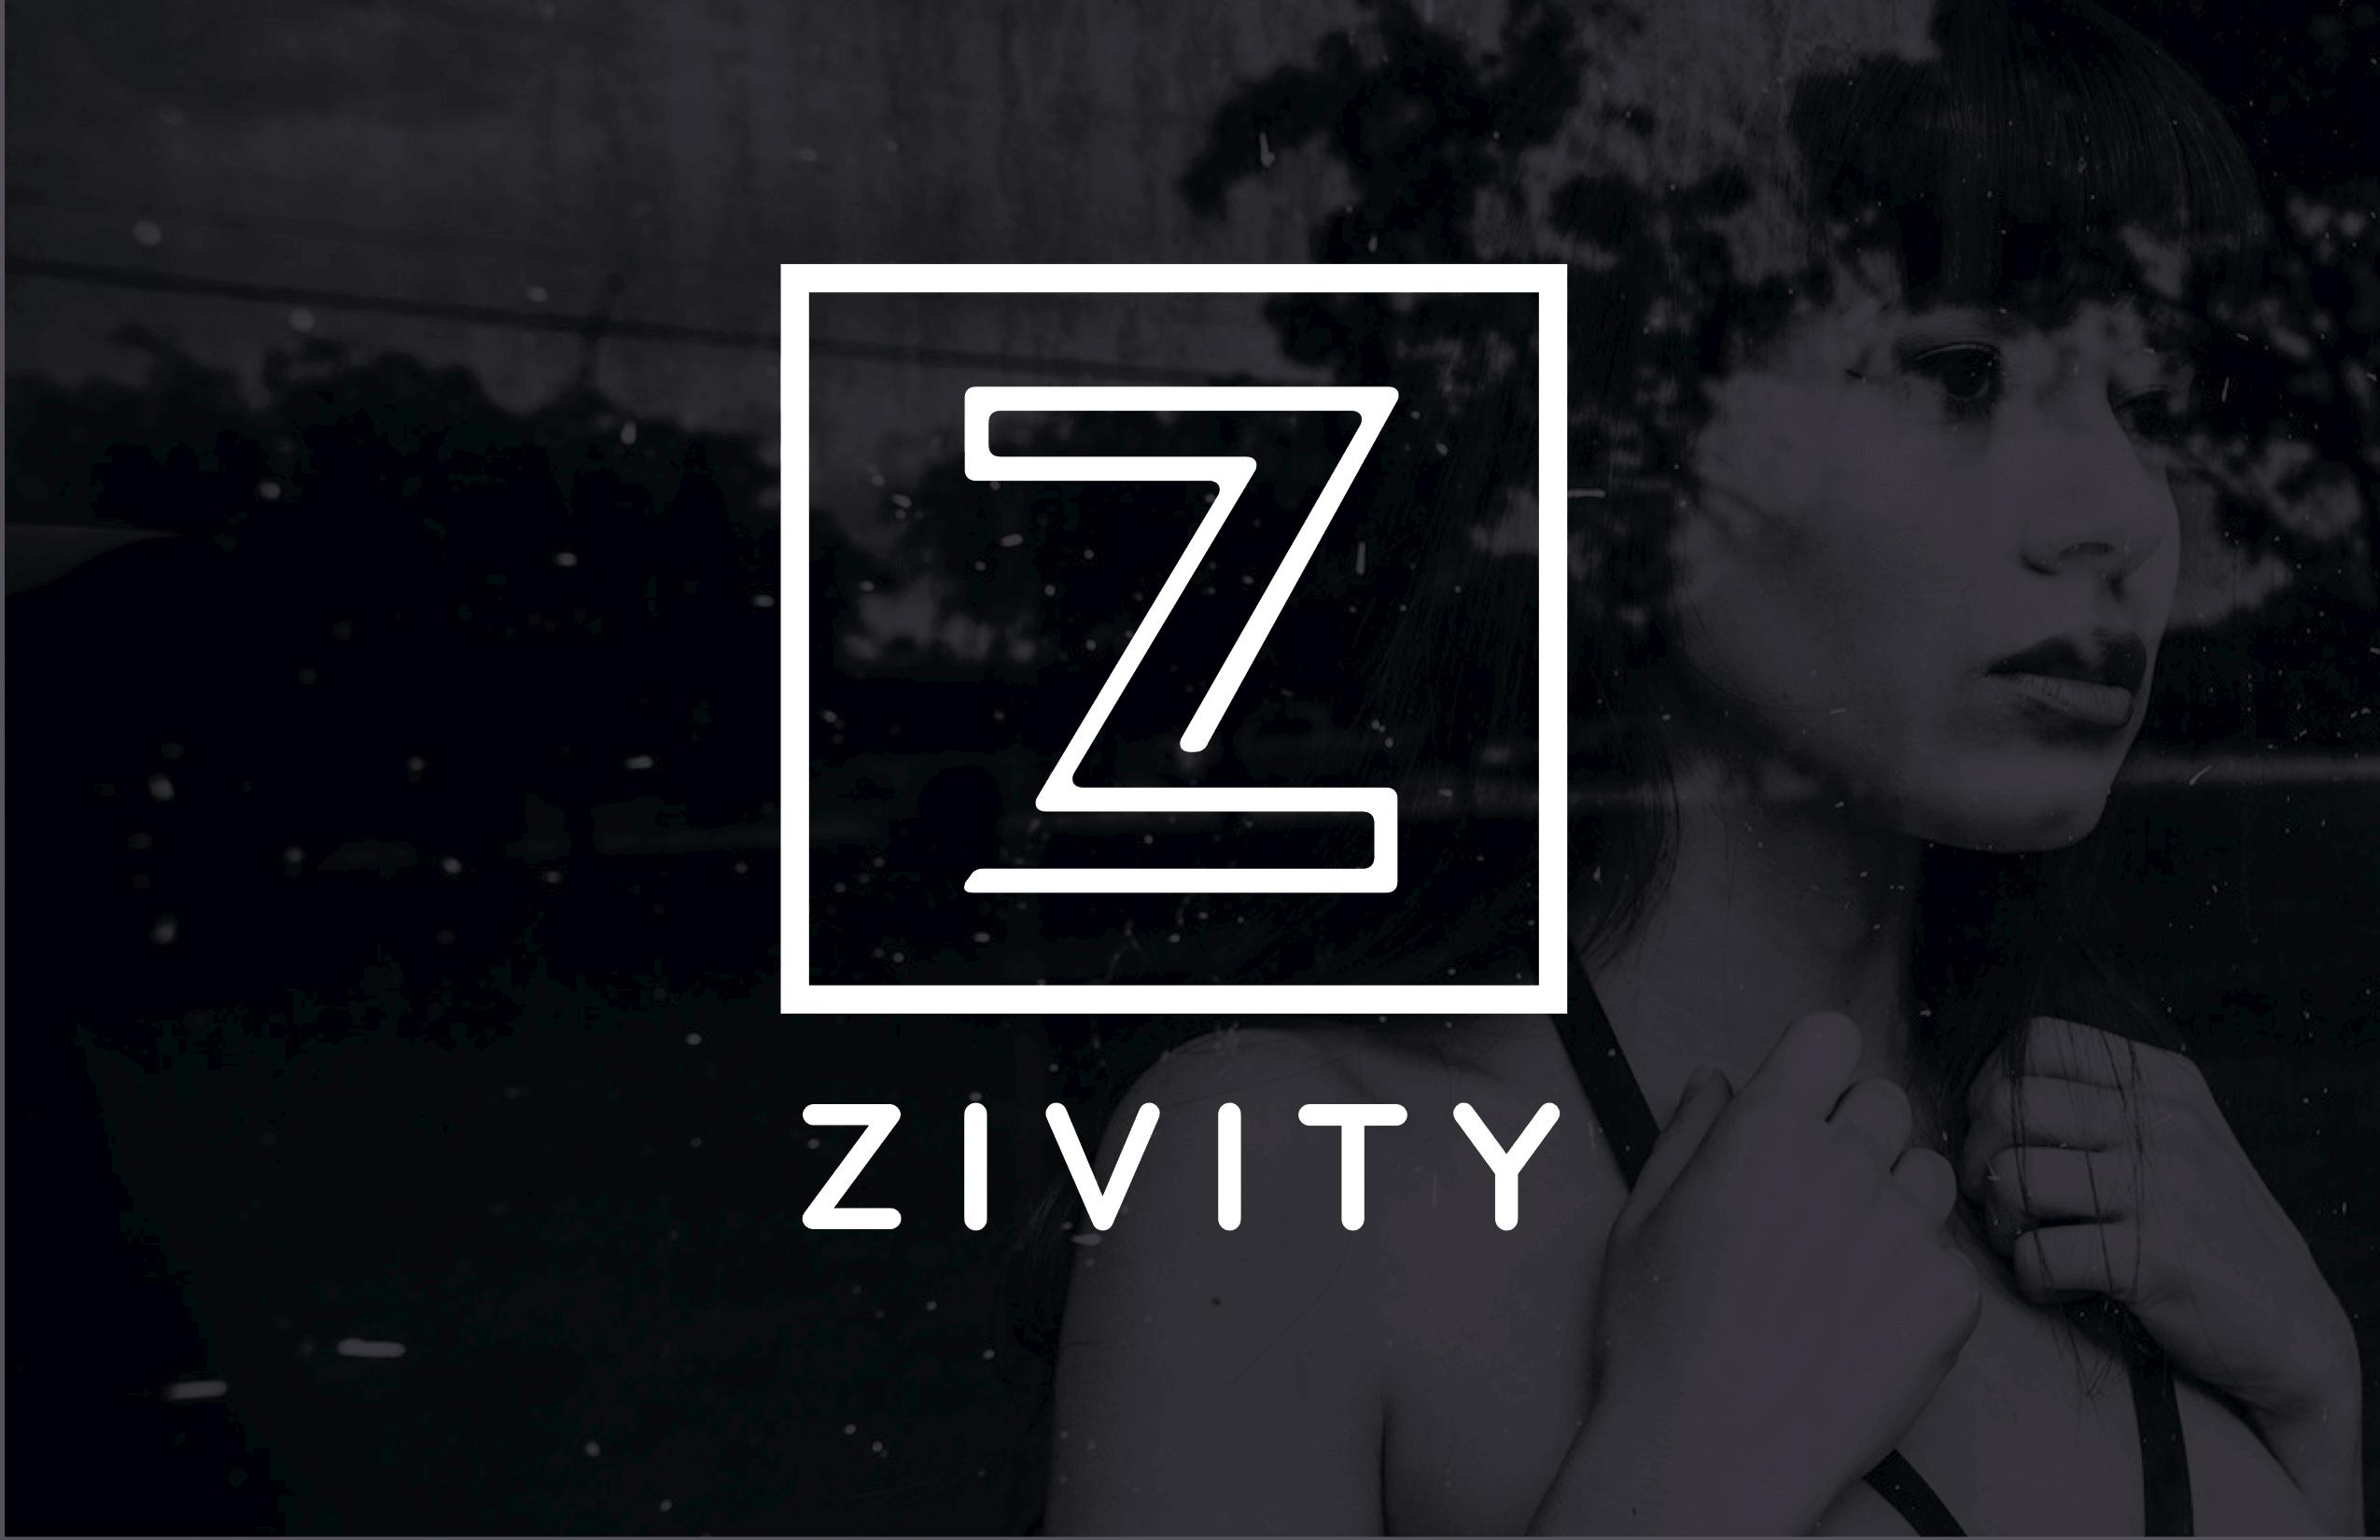 Zivity - image 1 - student project